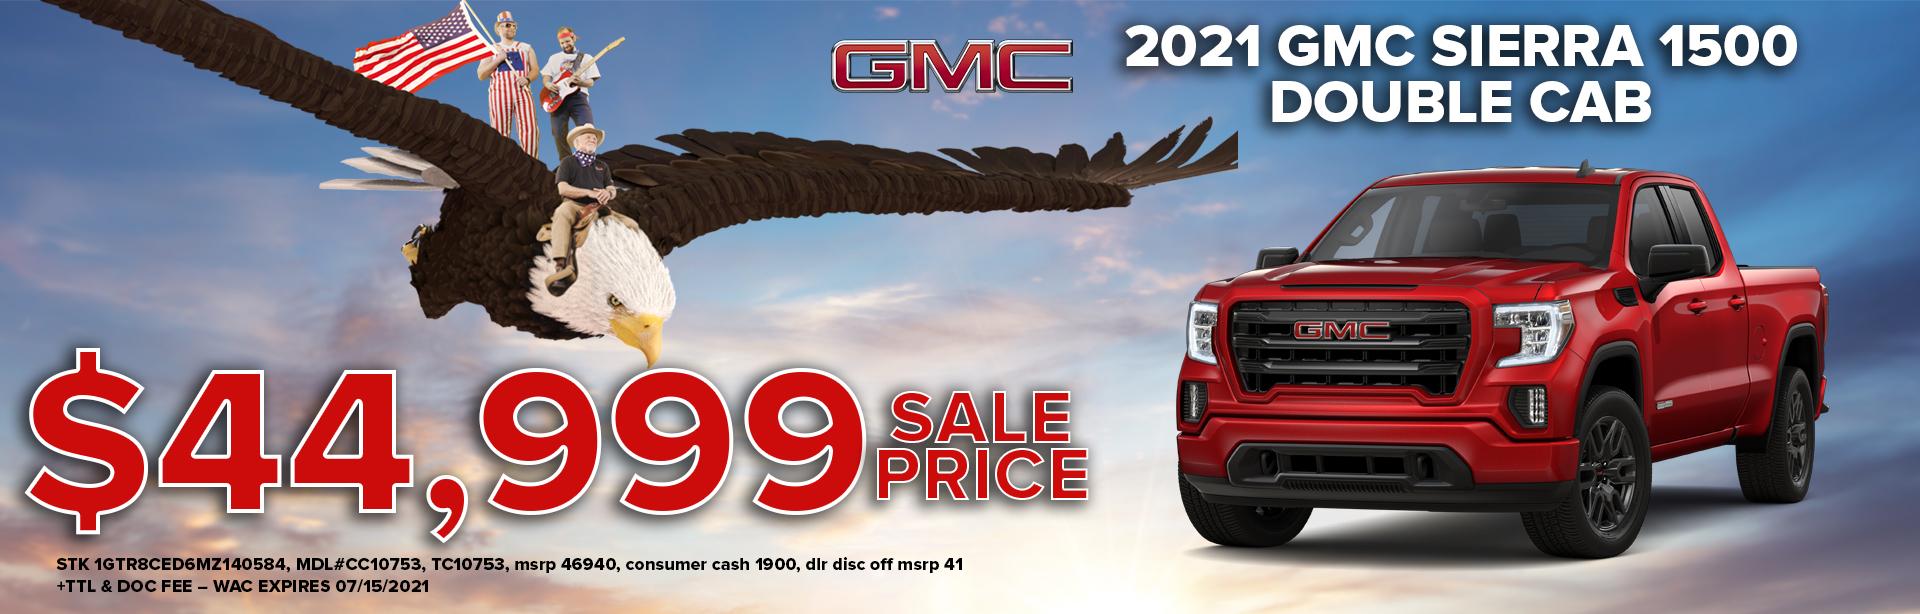 get a 2021 gmc sierra 1500 for $44,999